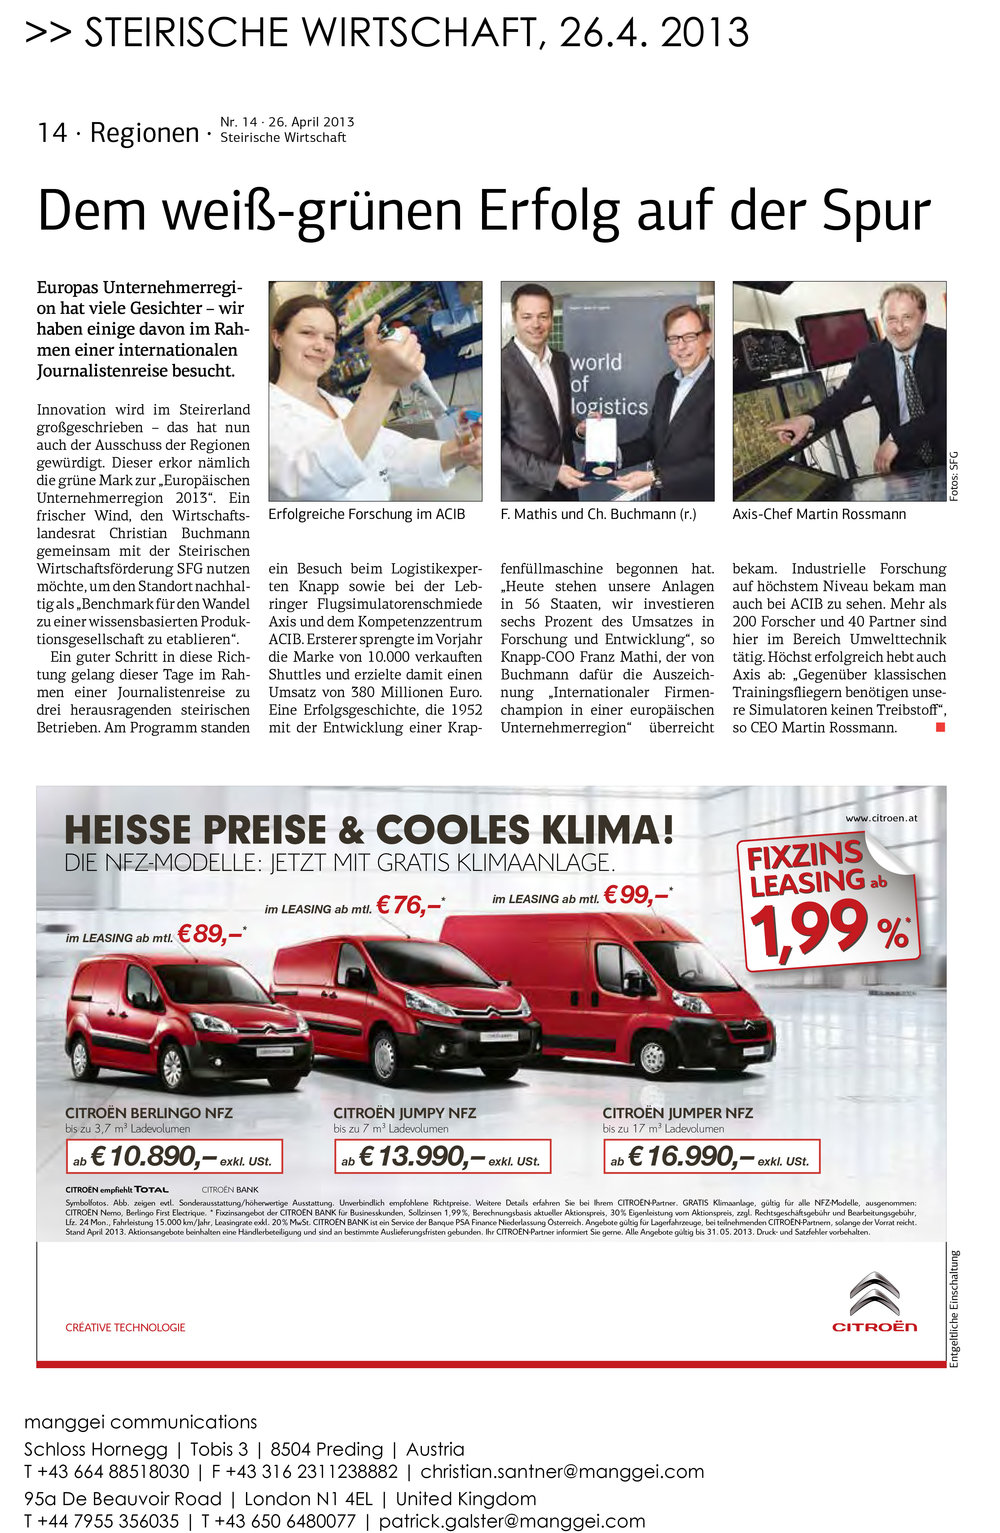 manggei-communications---presse-clippings-komplett---journalistenreise-2013_-14.jpg